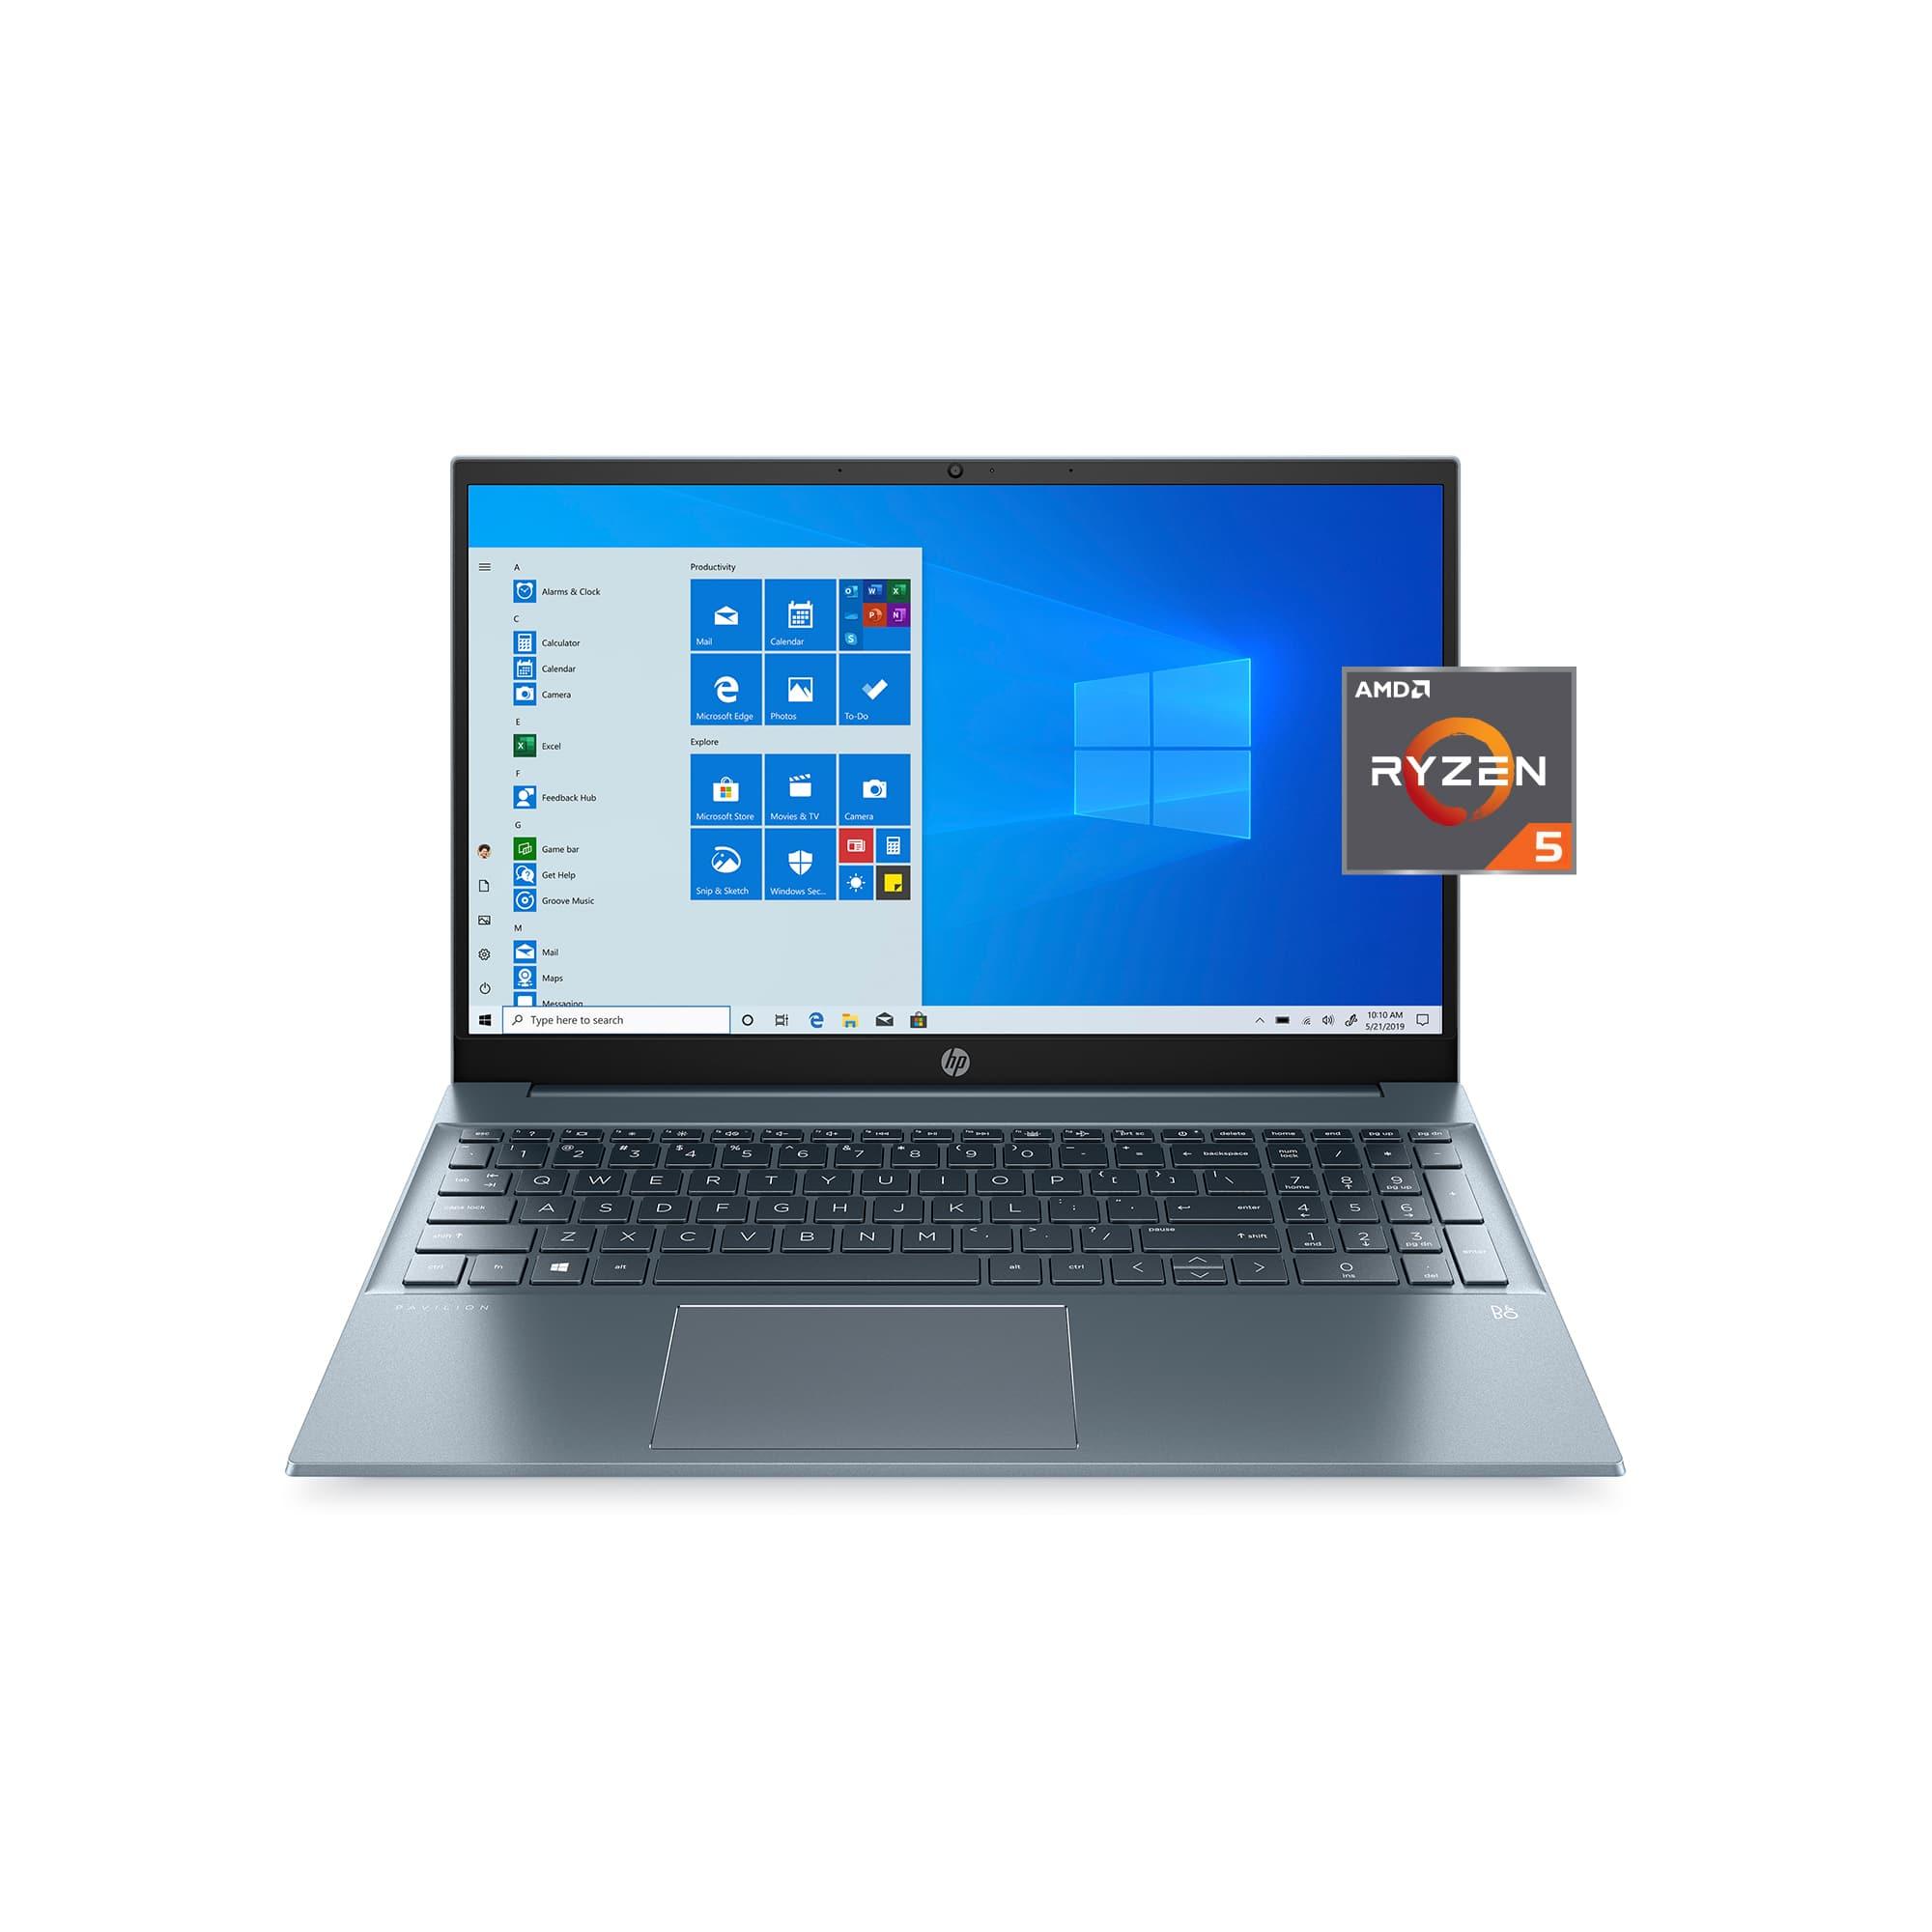 "HP Pavilion Laptop: Ryzen 5 4500U, 15.6"" IPS, 8GB DDR4, 512GB SSD"